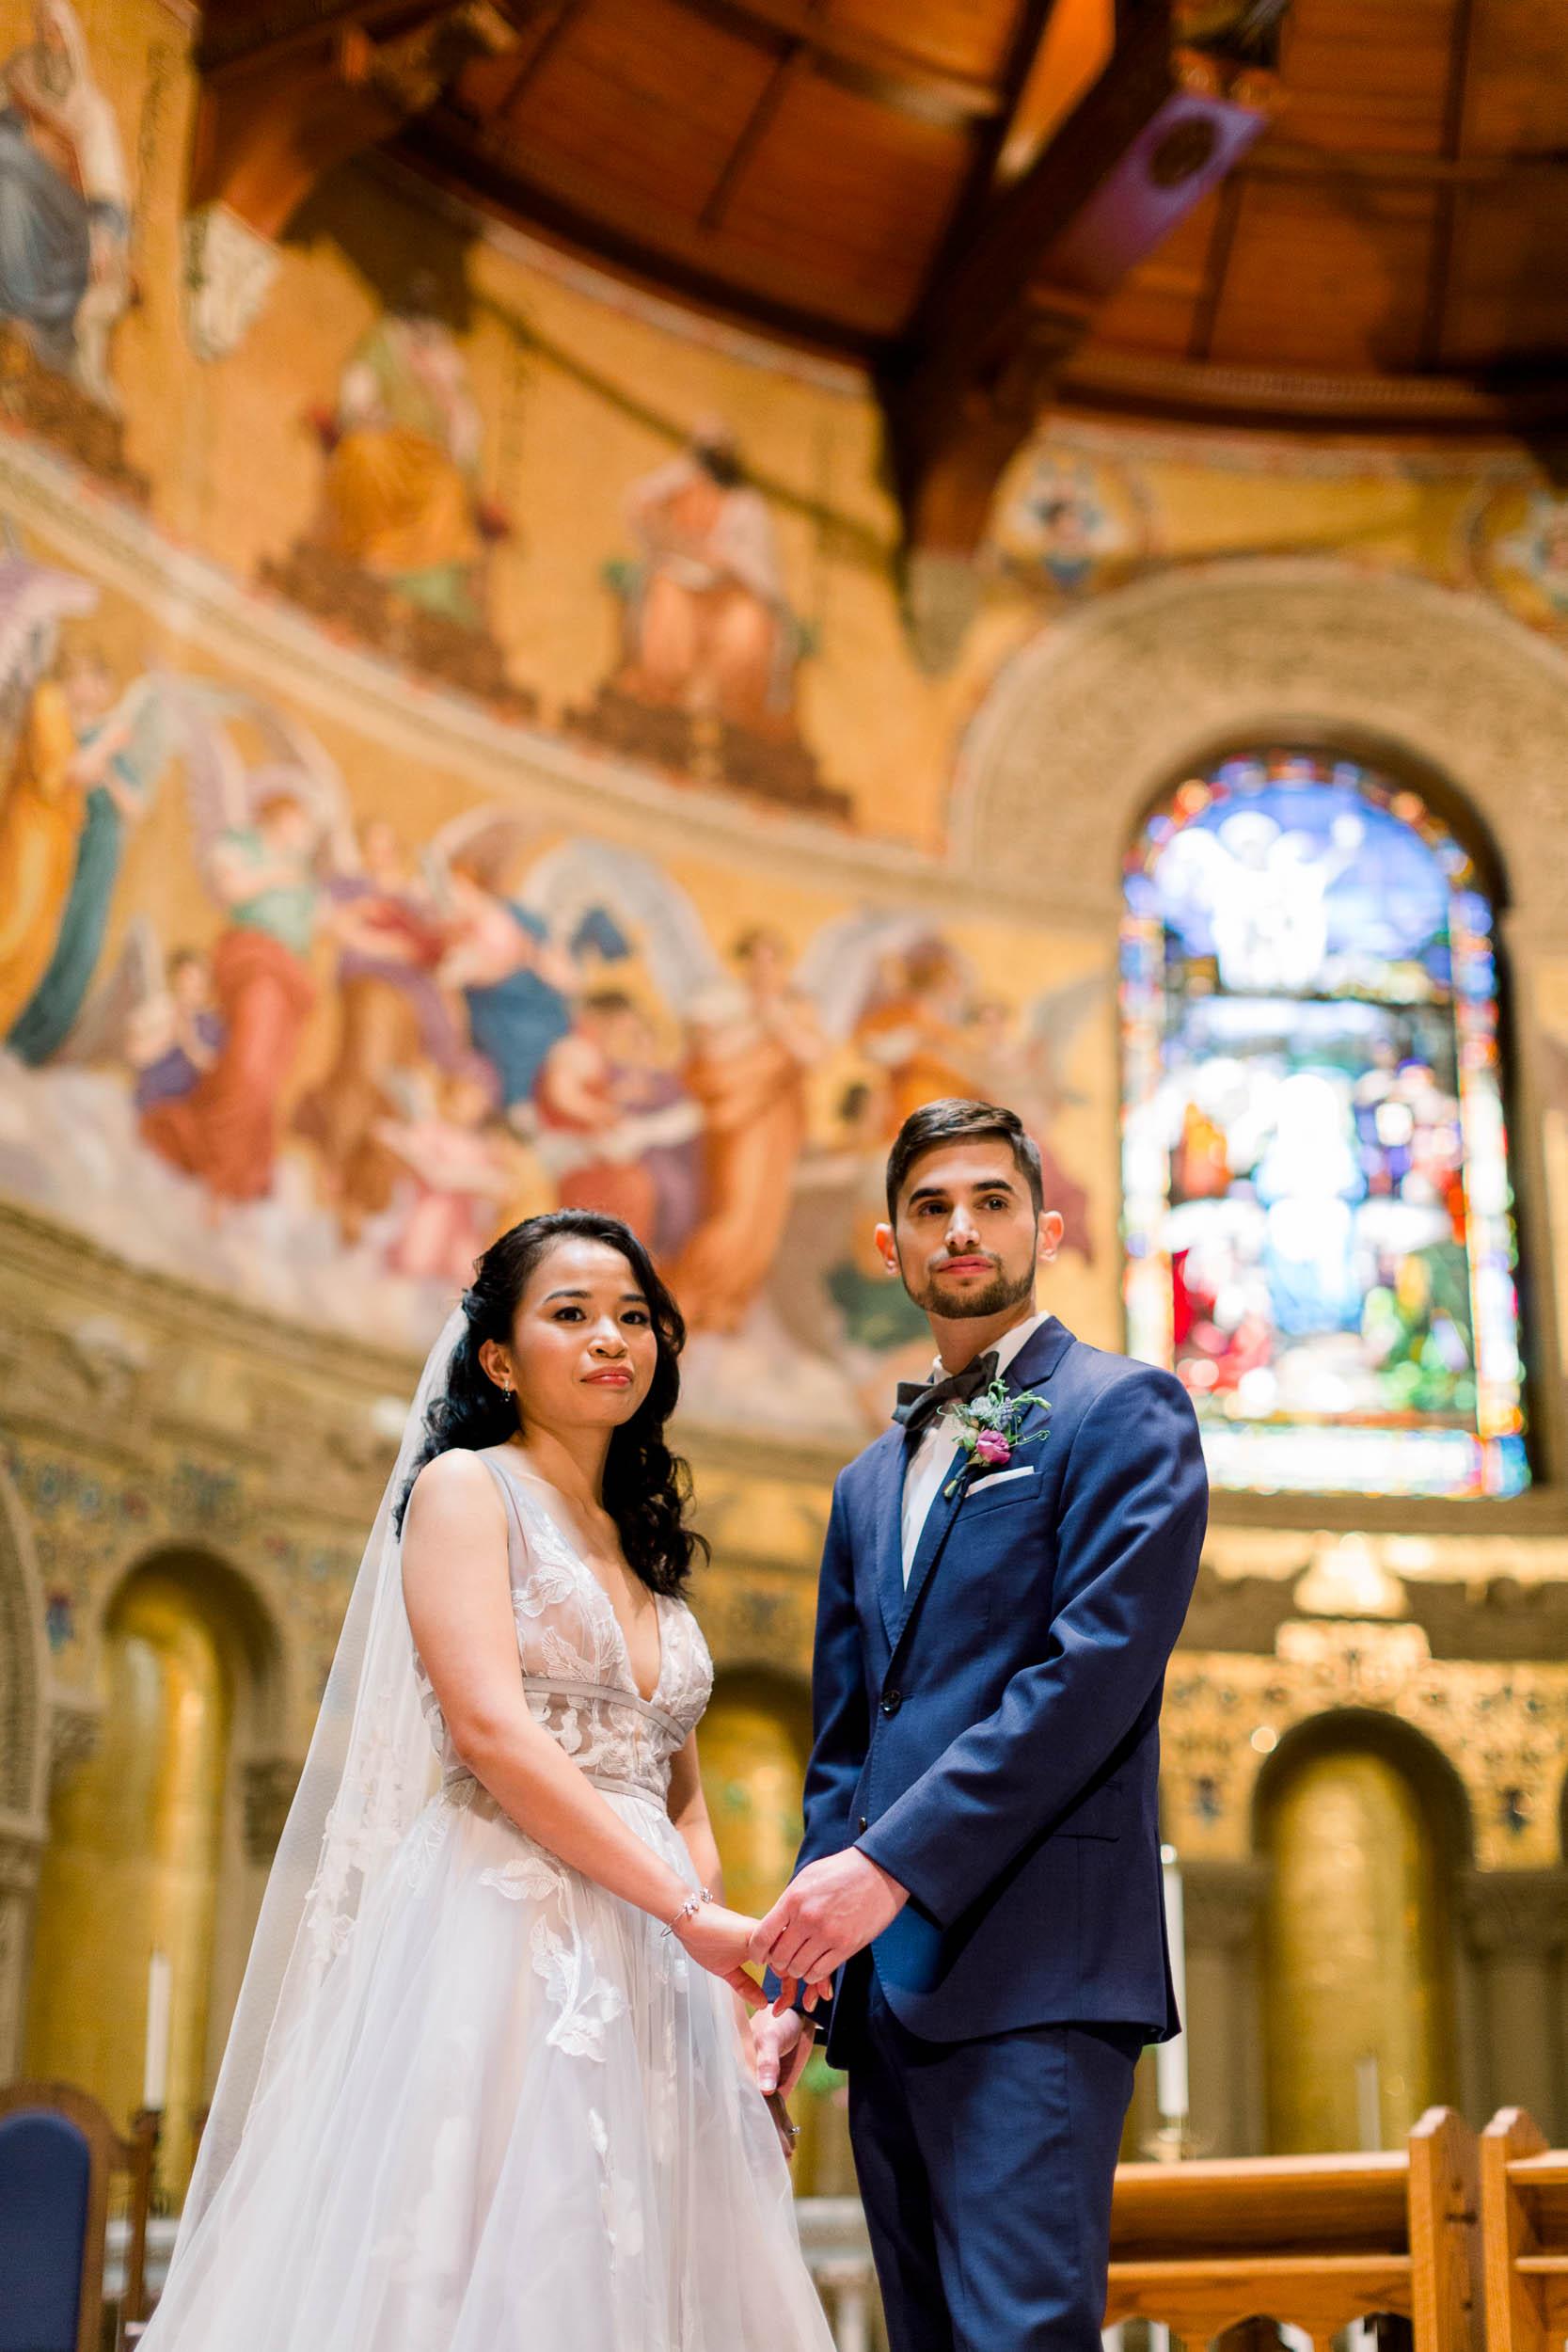 052519_B+S_Hidden Villa Wedding_Buena Lane Photography_052519_0252CY.jpg